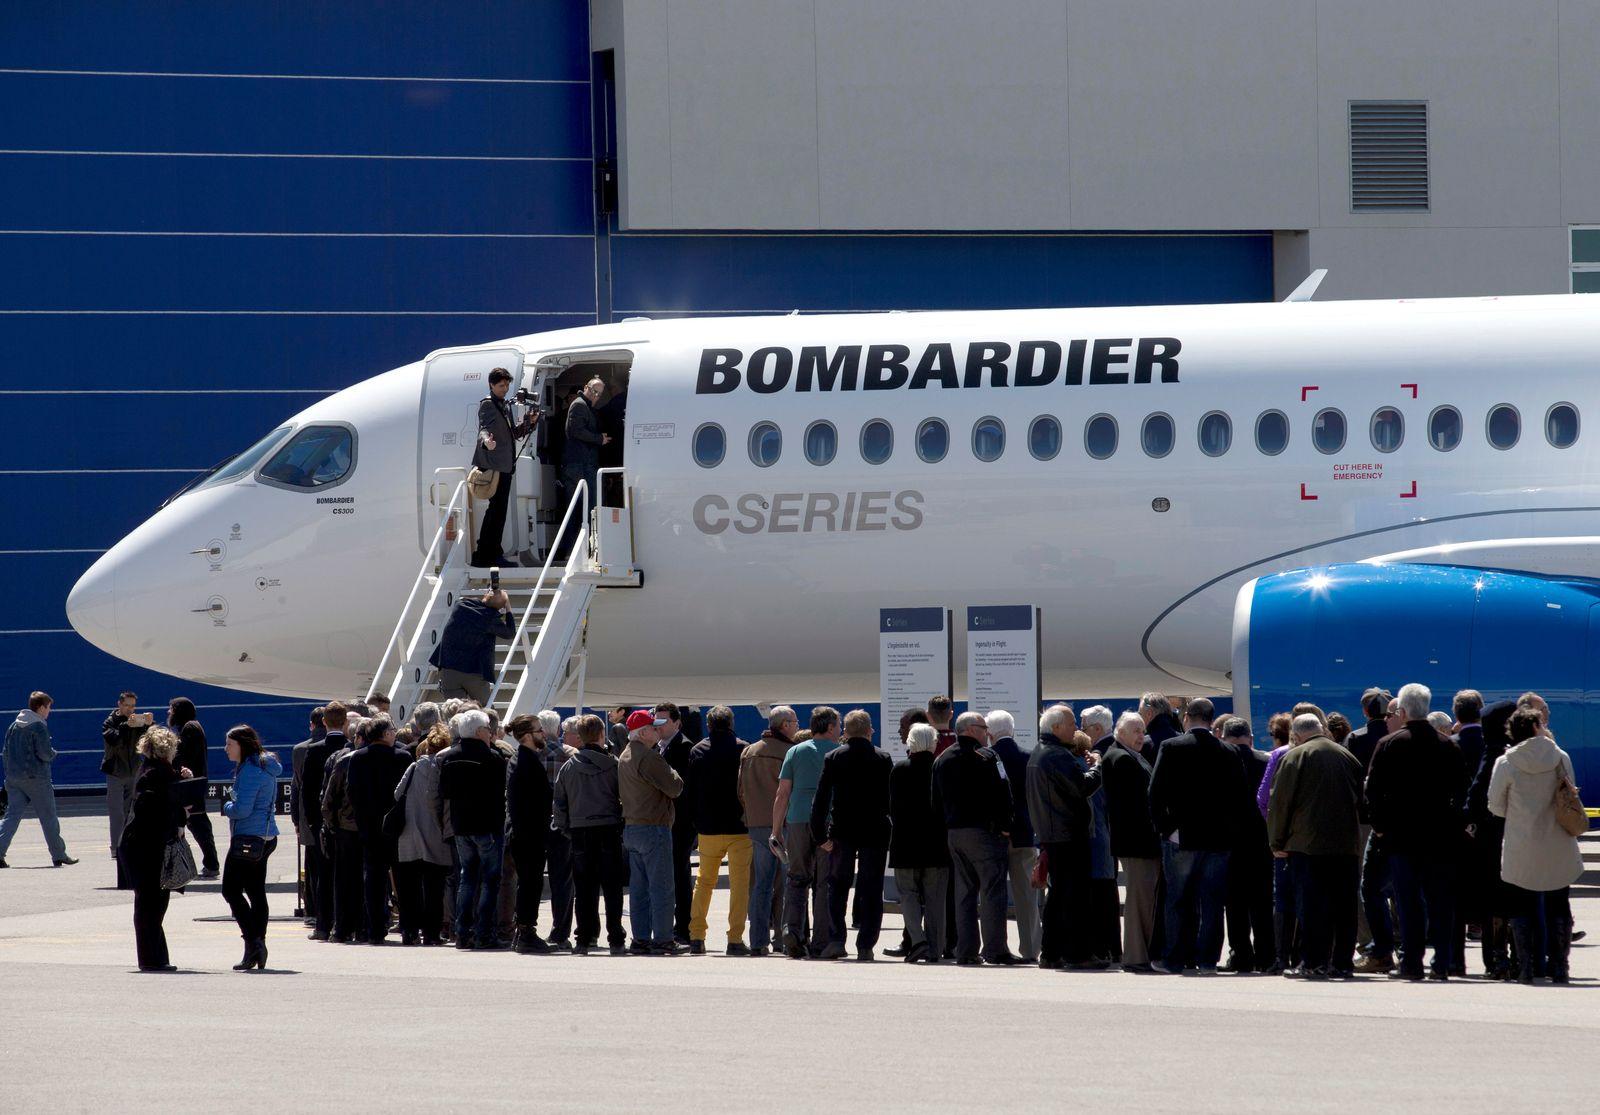 Flugzeug Bombardier CS300